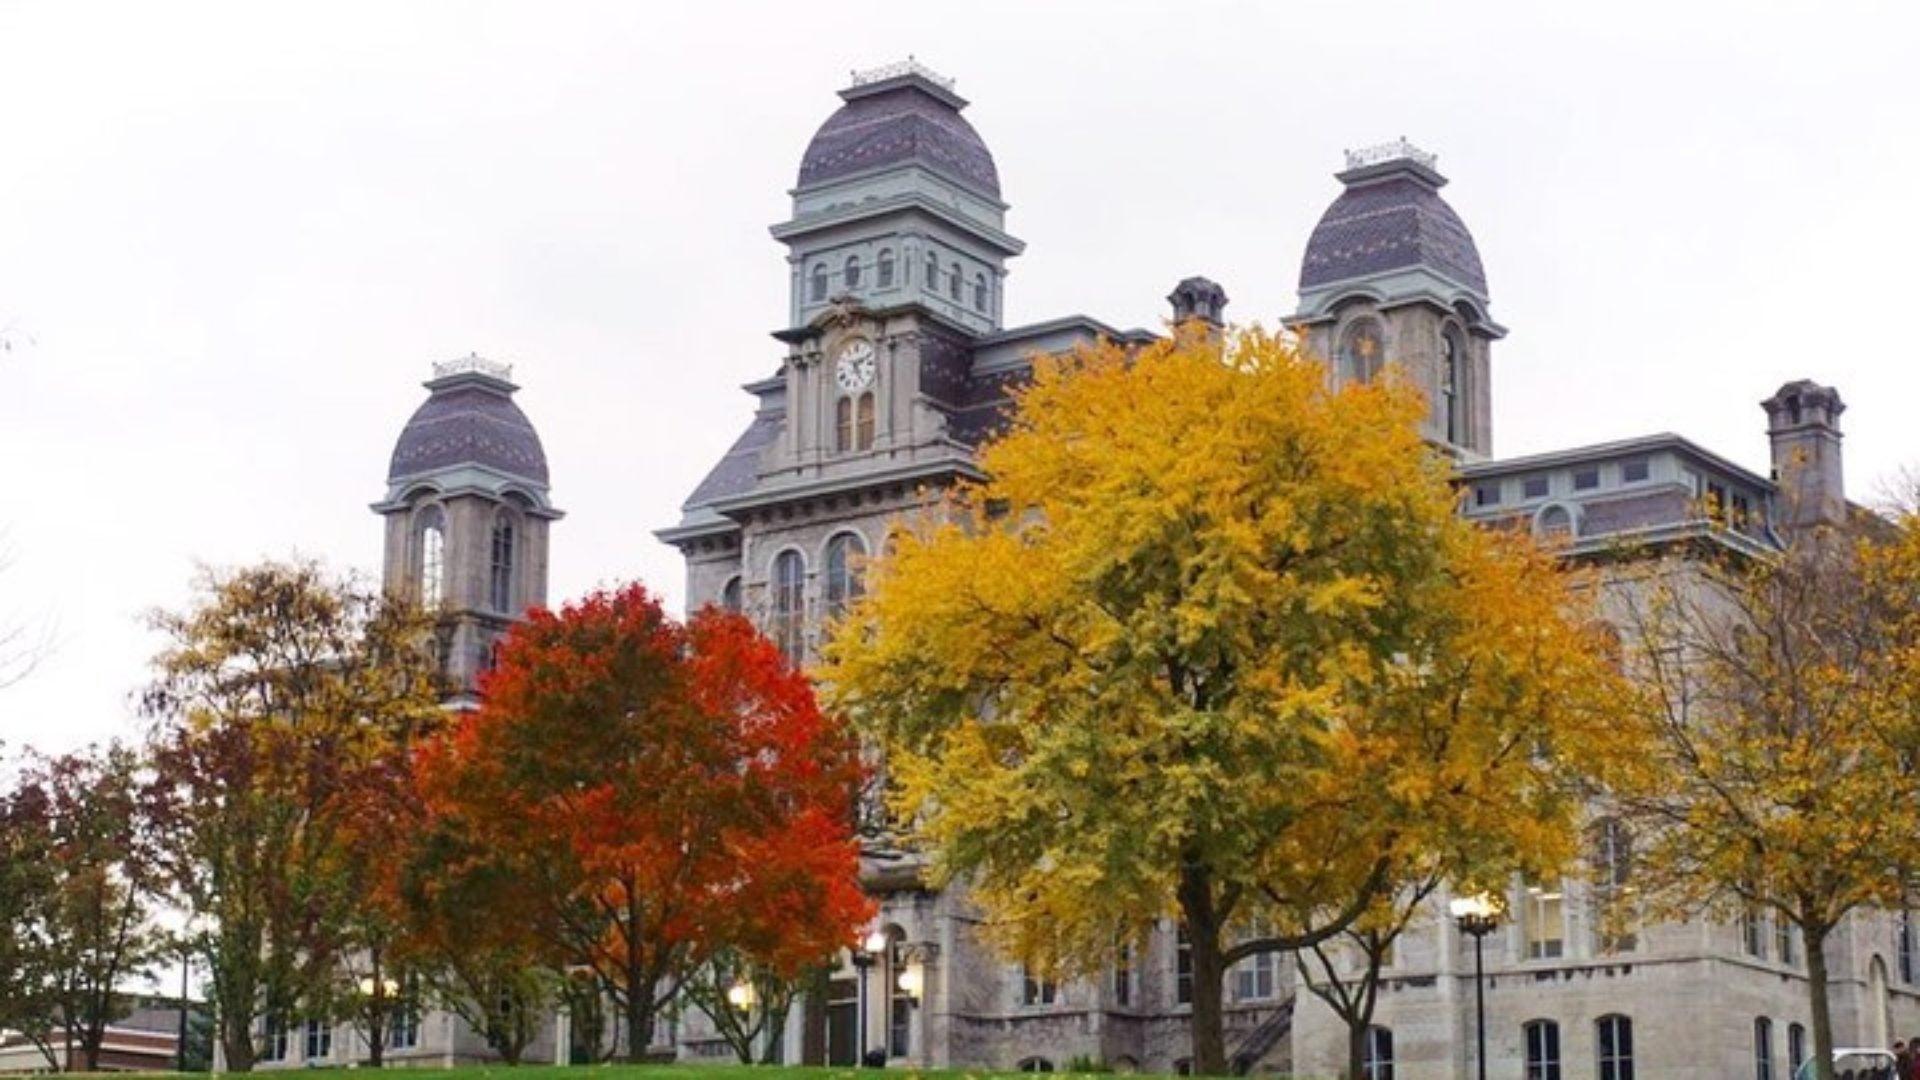 Syracuse University Suspends Social Activities Following Slew of Racial Incidents